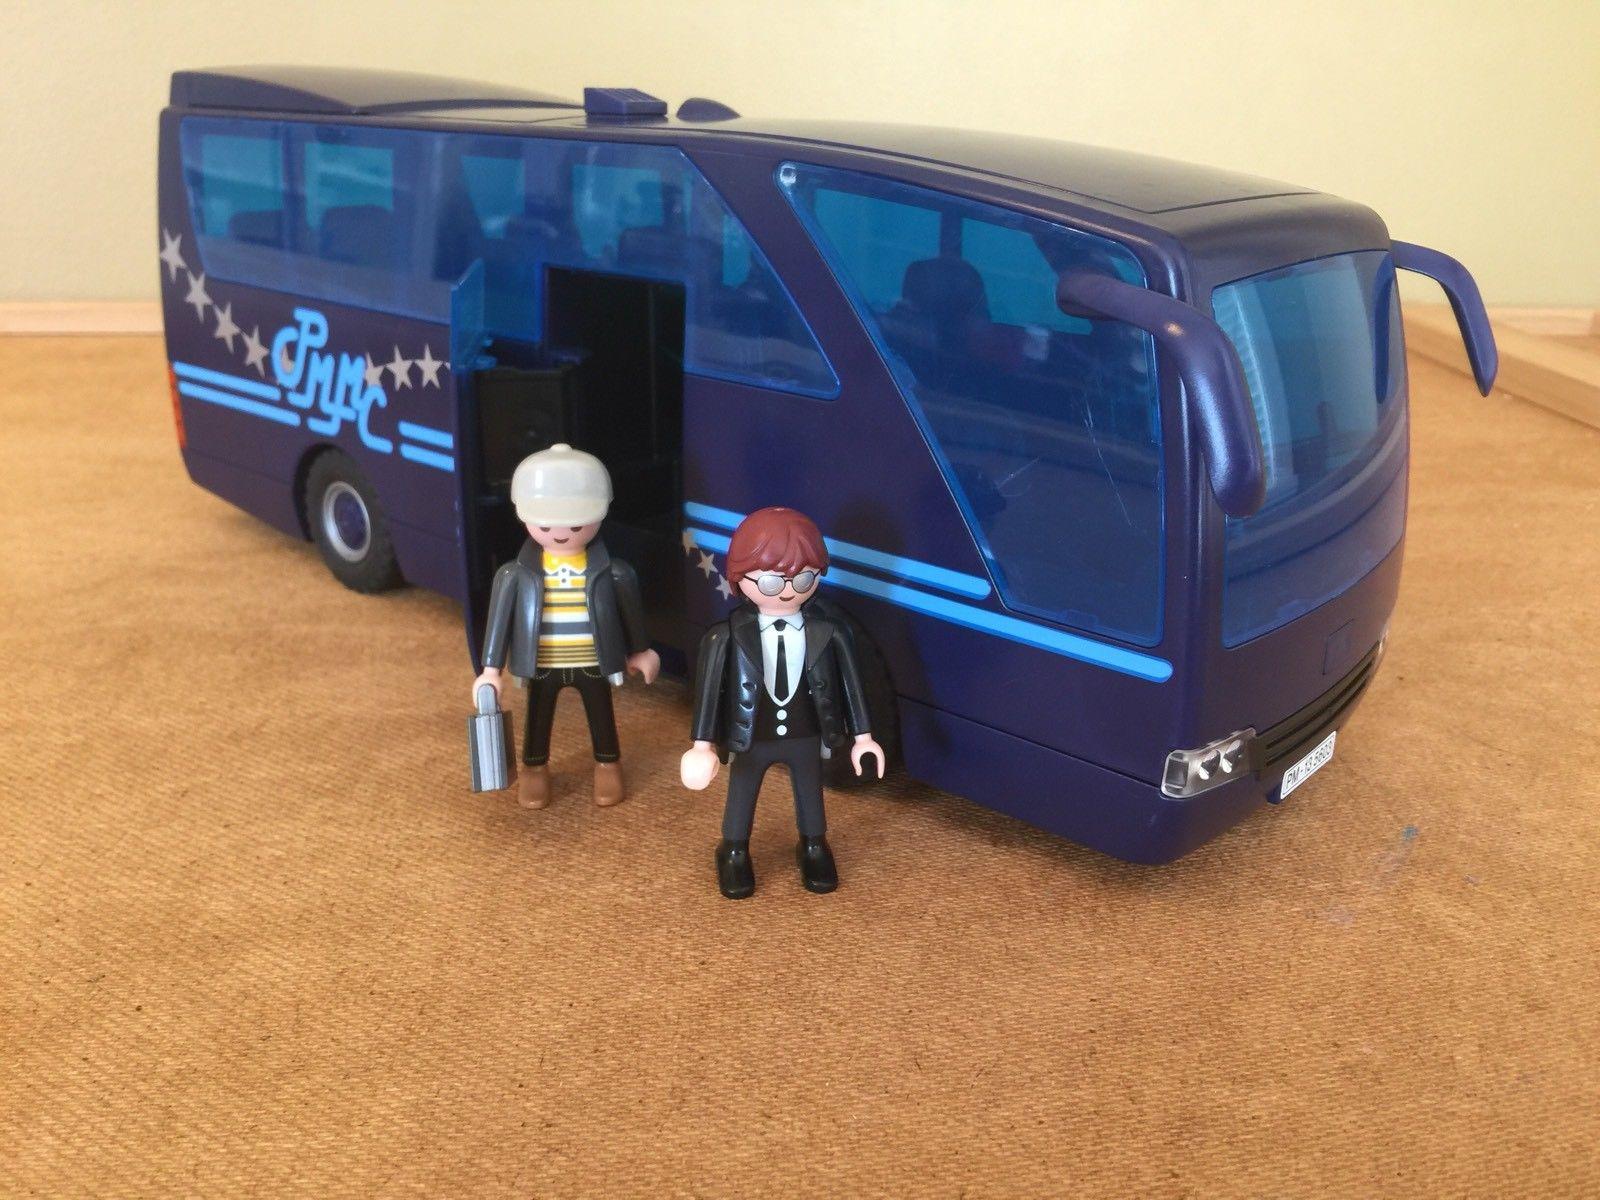 Bus 5106 Prix Playmobil 5106 Bus Playmobil Prix Bus 45R3LcAqj